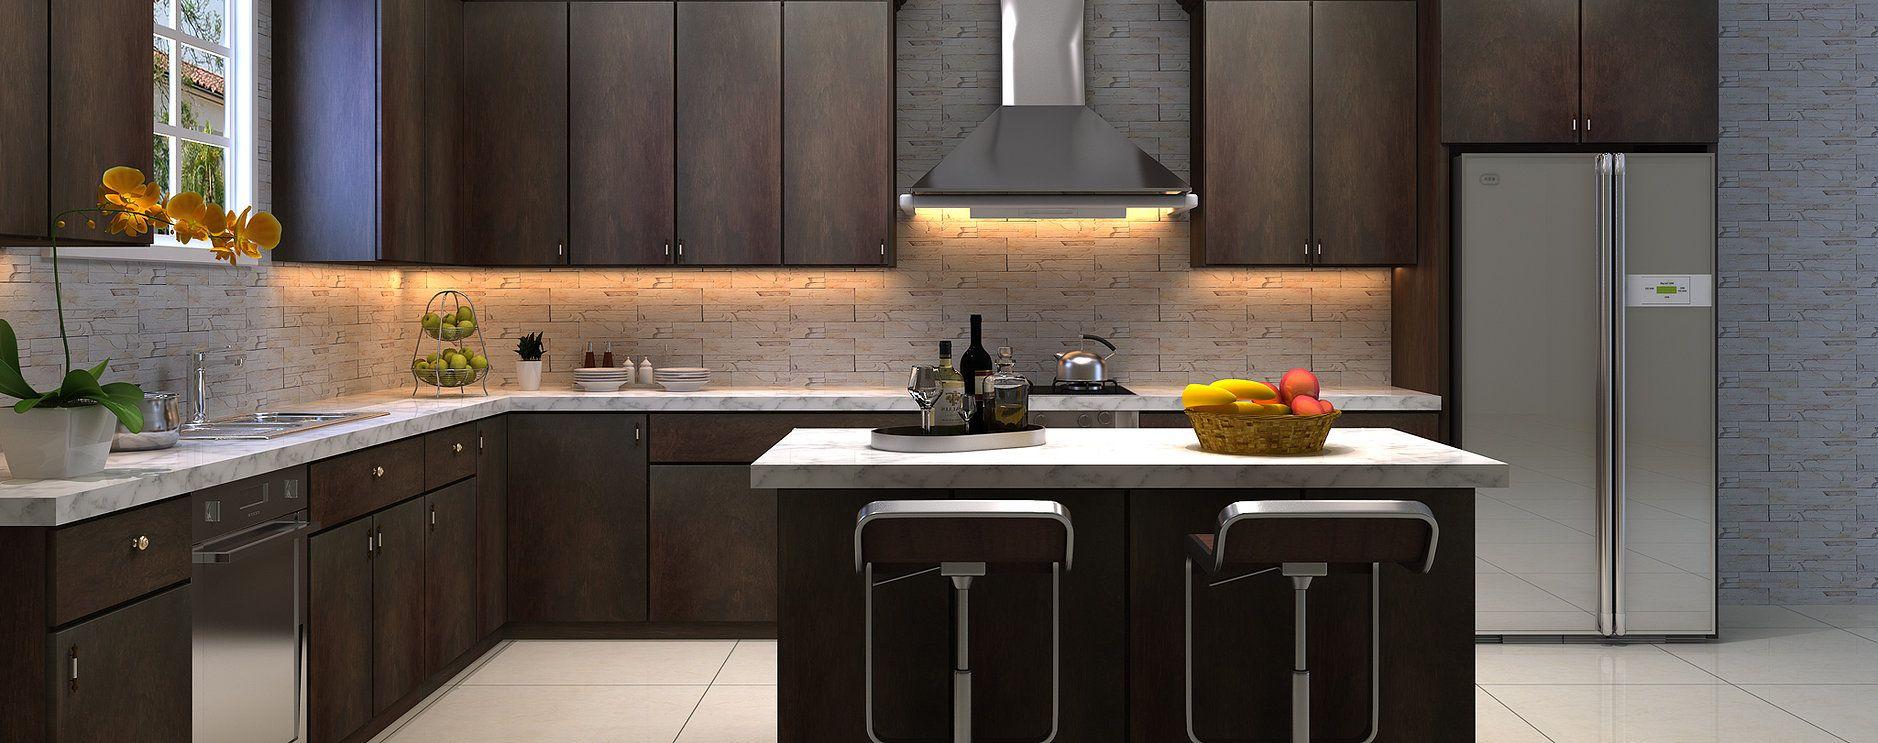 Procraft Cabinetry Semi Custom Kitchen Cabinets Assembled Kitchen Cabinets Amish Kitchen Cabinets